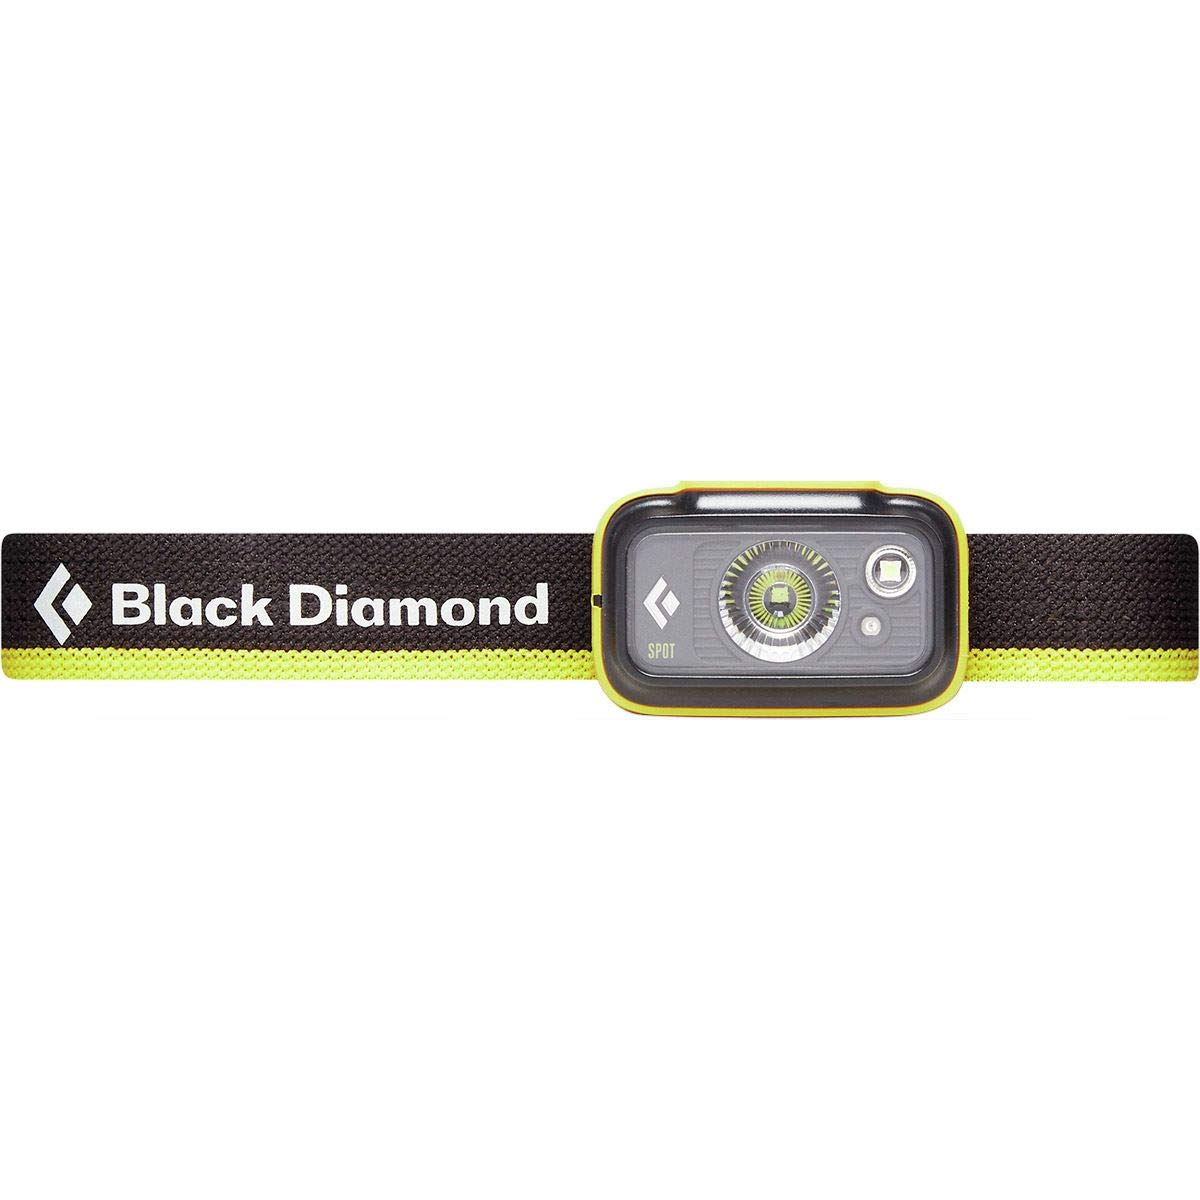 Black Diamond Spot325 Lampe Frontale, Unisex-Adult, Azul, One Size BD6206414000ALL1